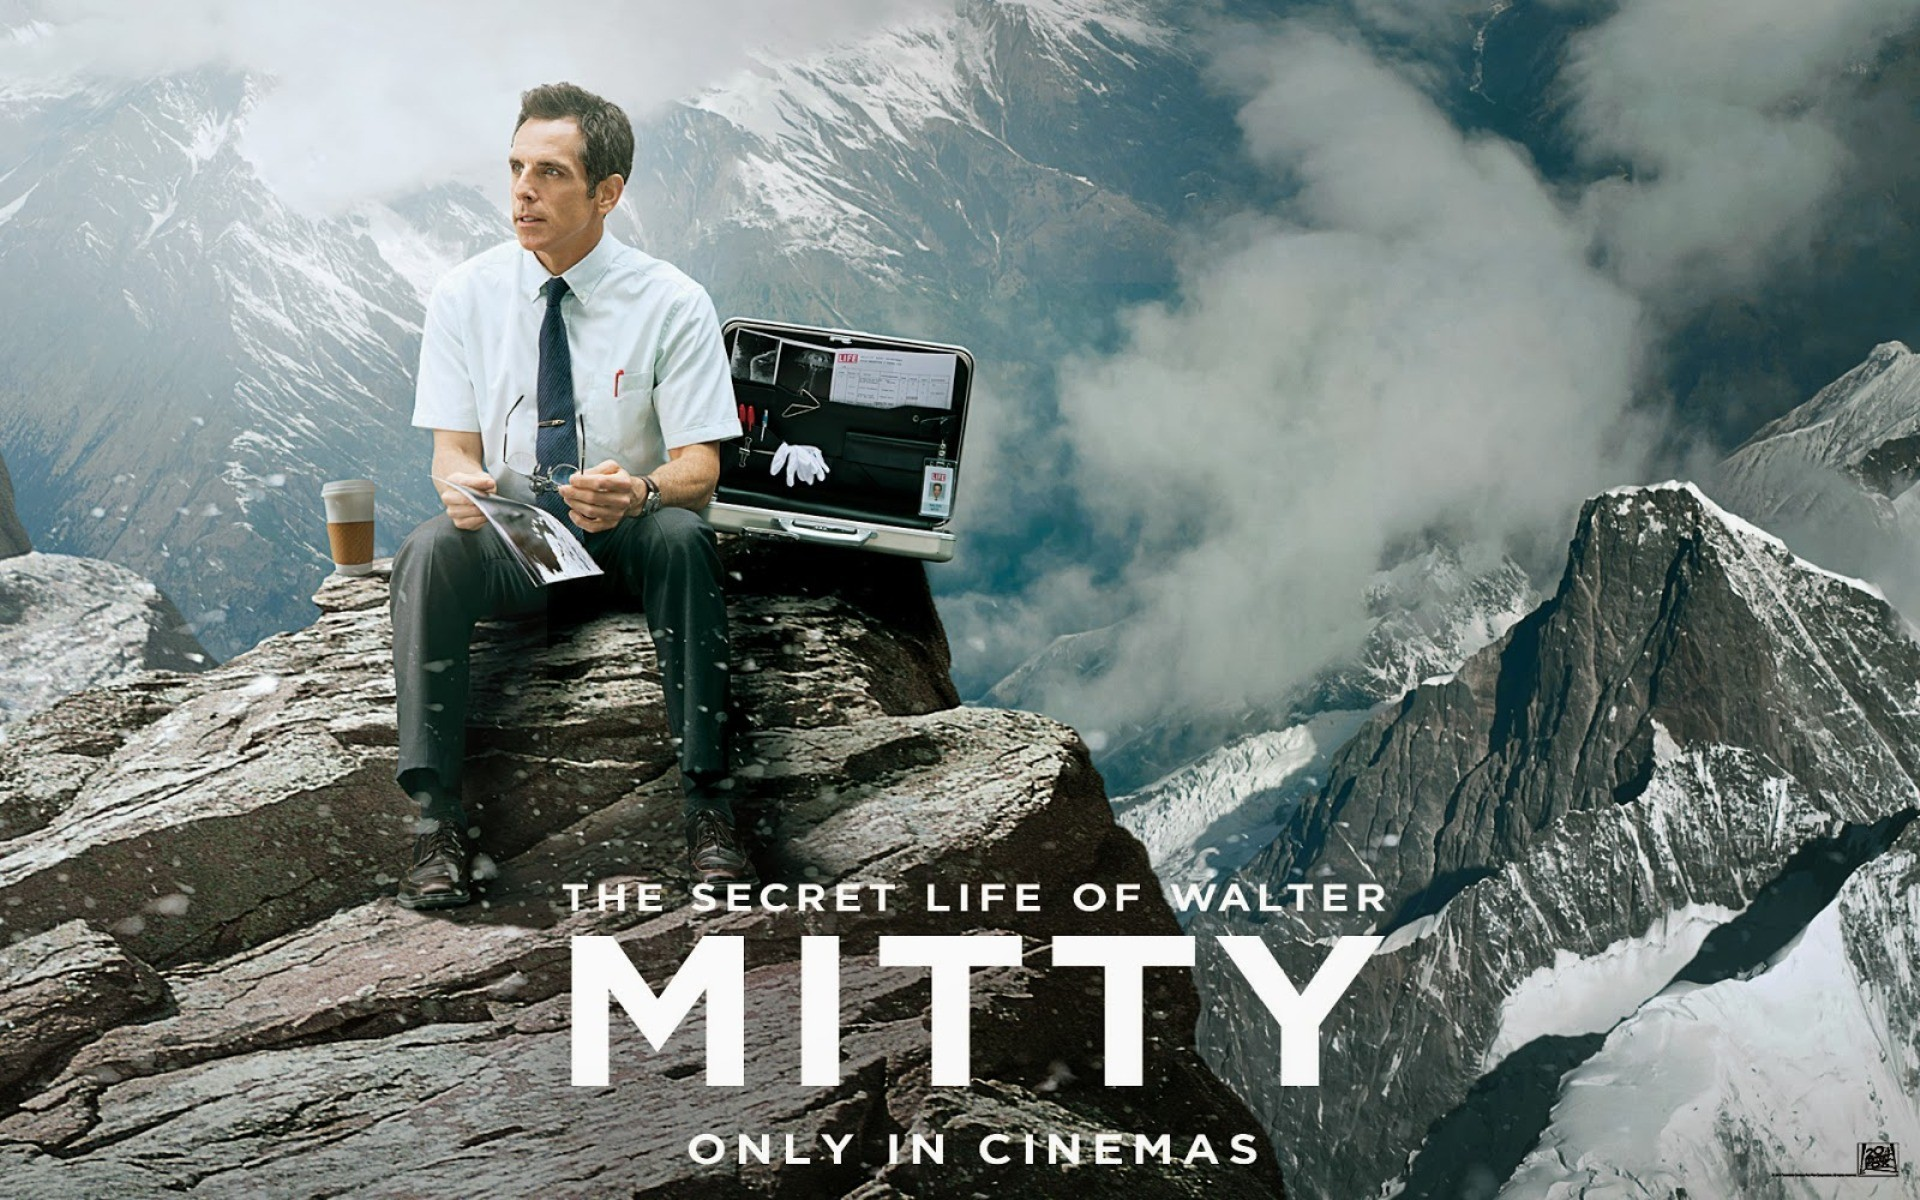 secret-life-mitty